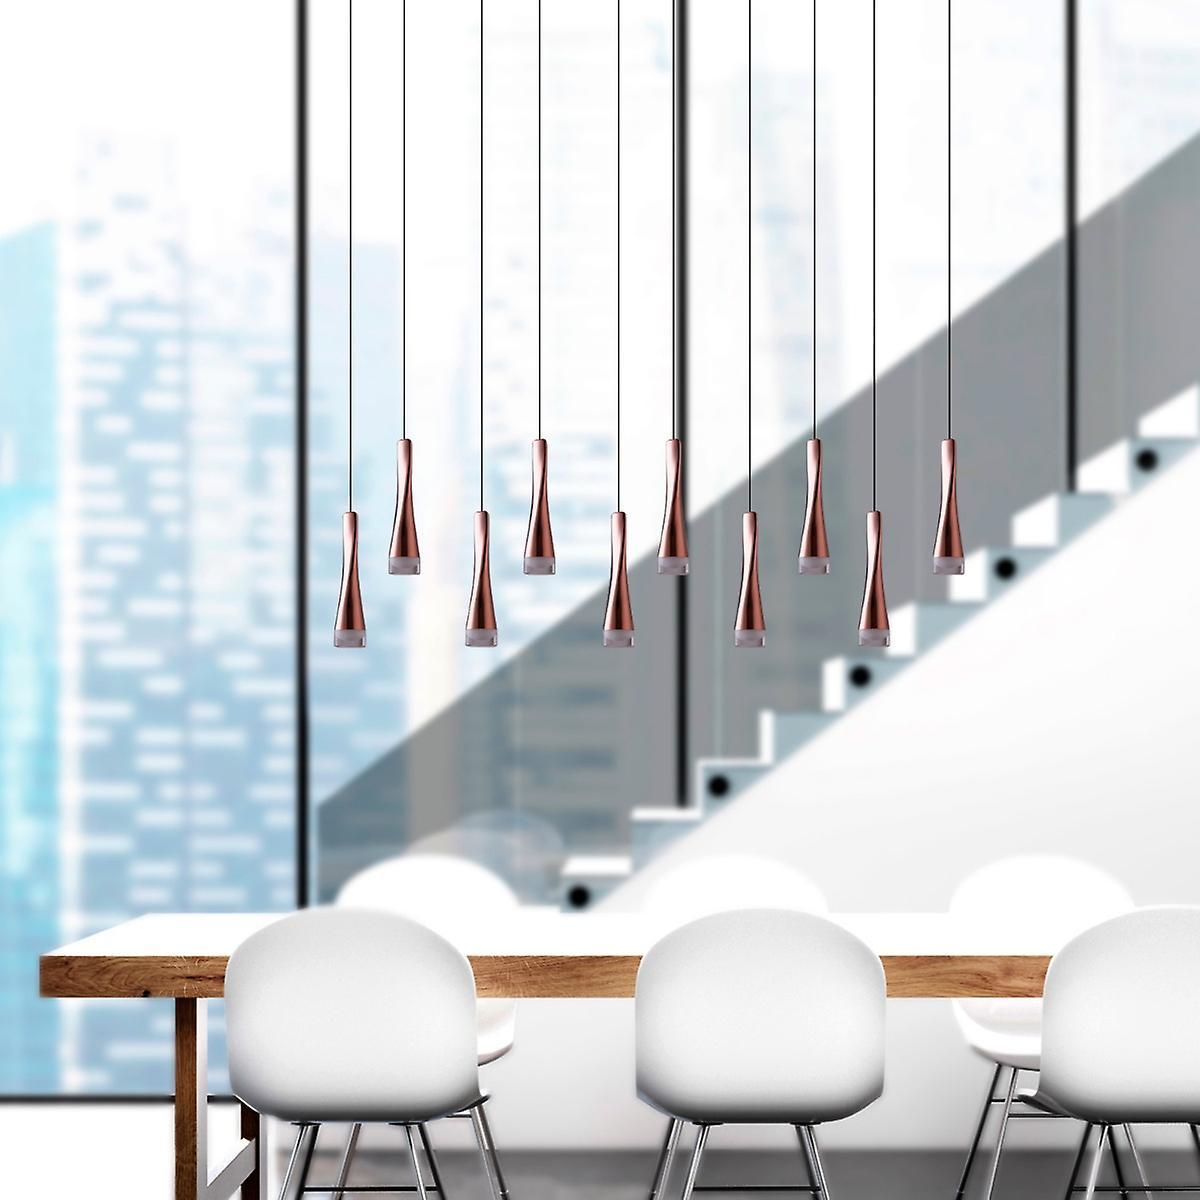 Pendant Lamp Ceiling Light Modern Hanging Industrial Ten Pendant Rectangular Canopy